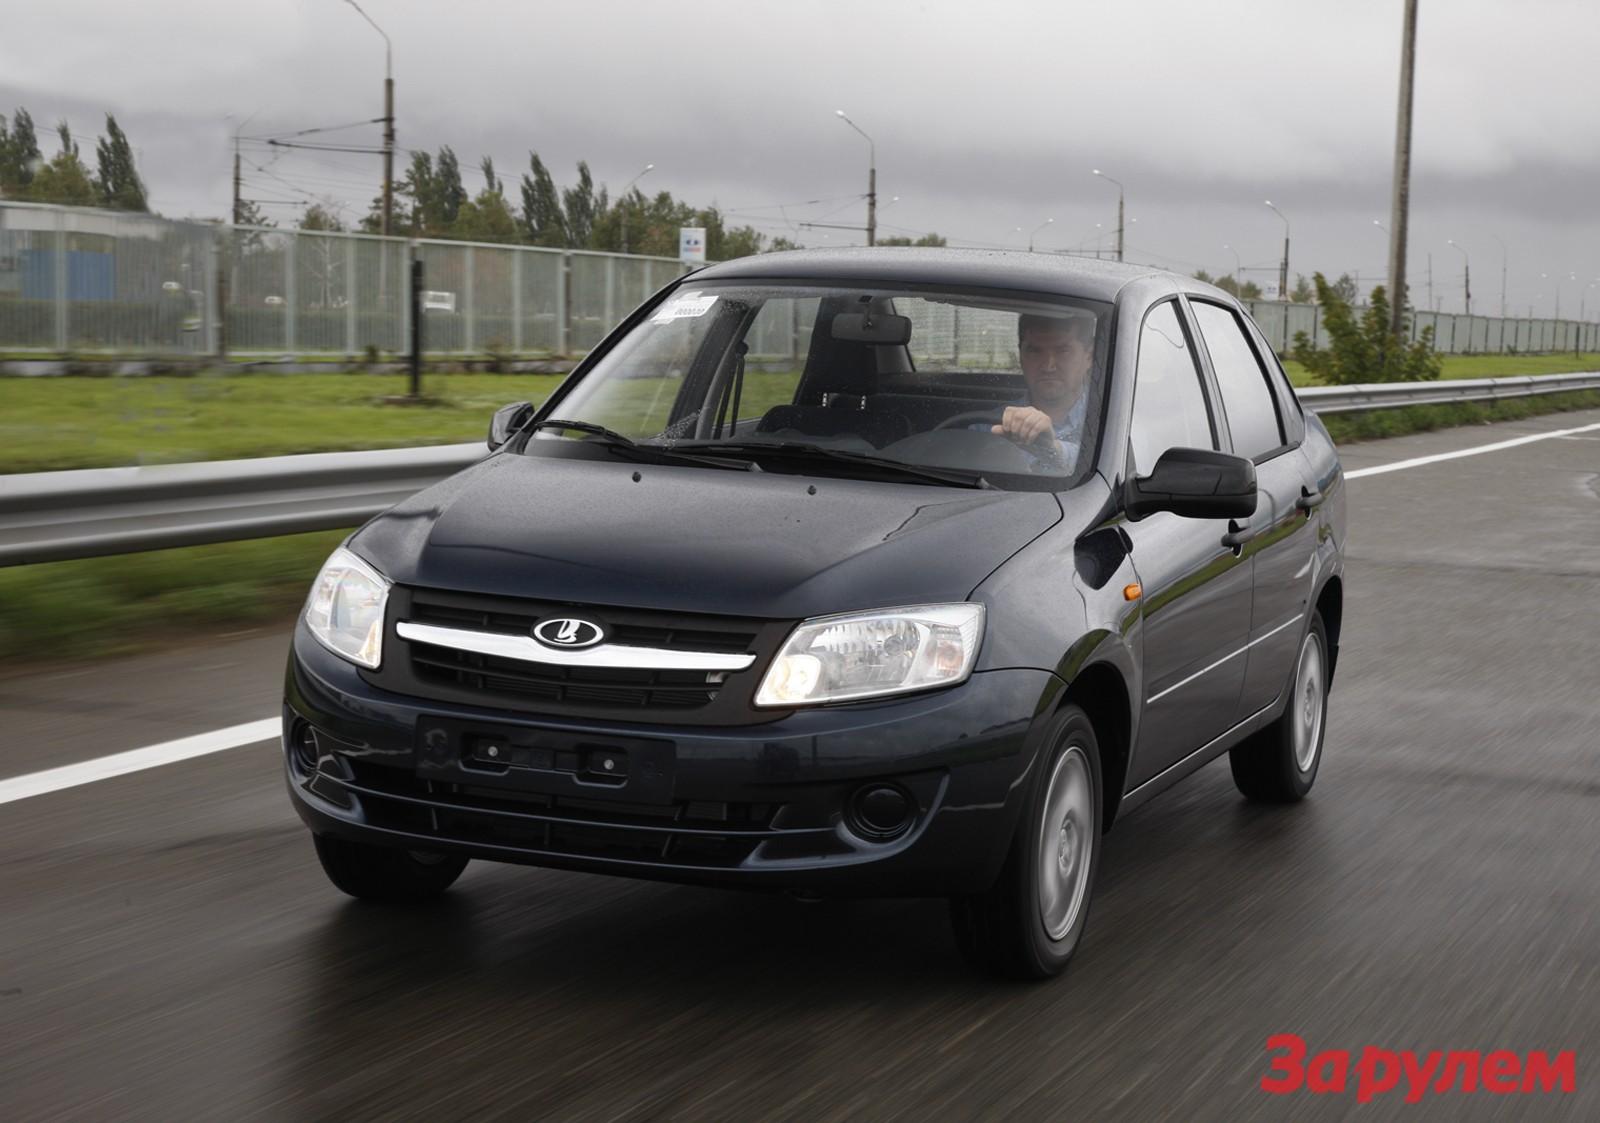 АвтоВАЗ улучшил тормоза на Kalinе и Grantе